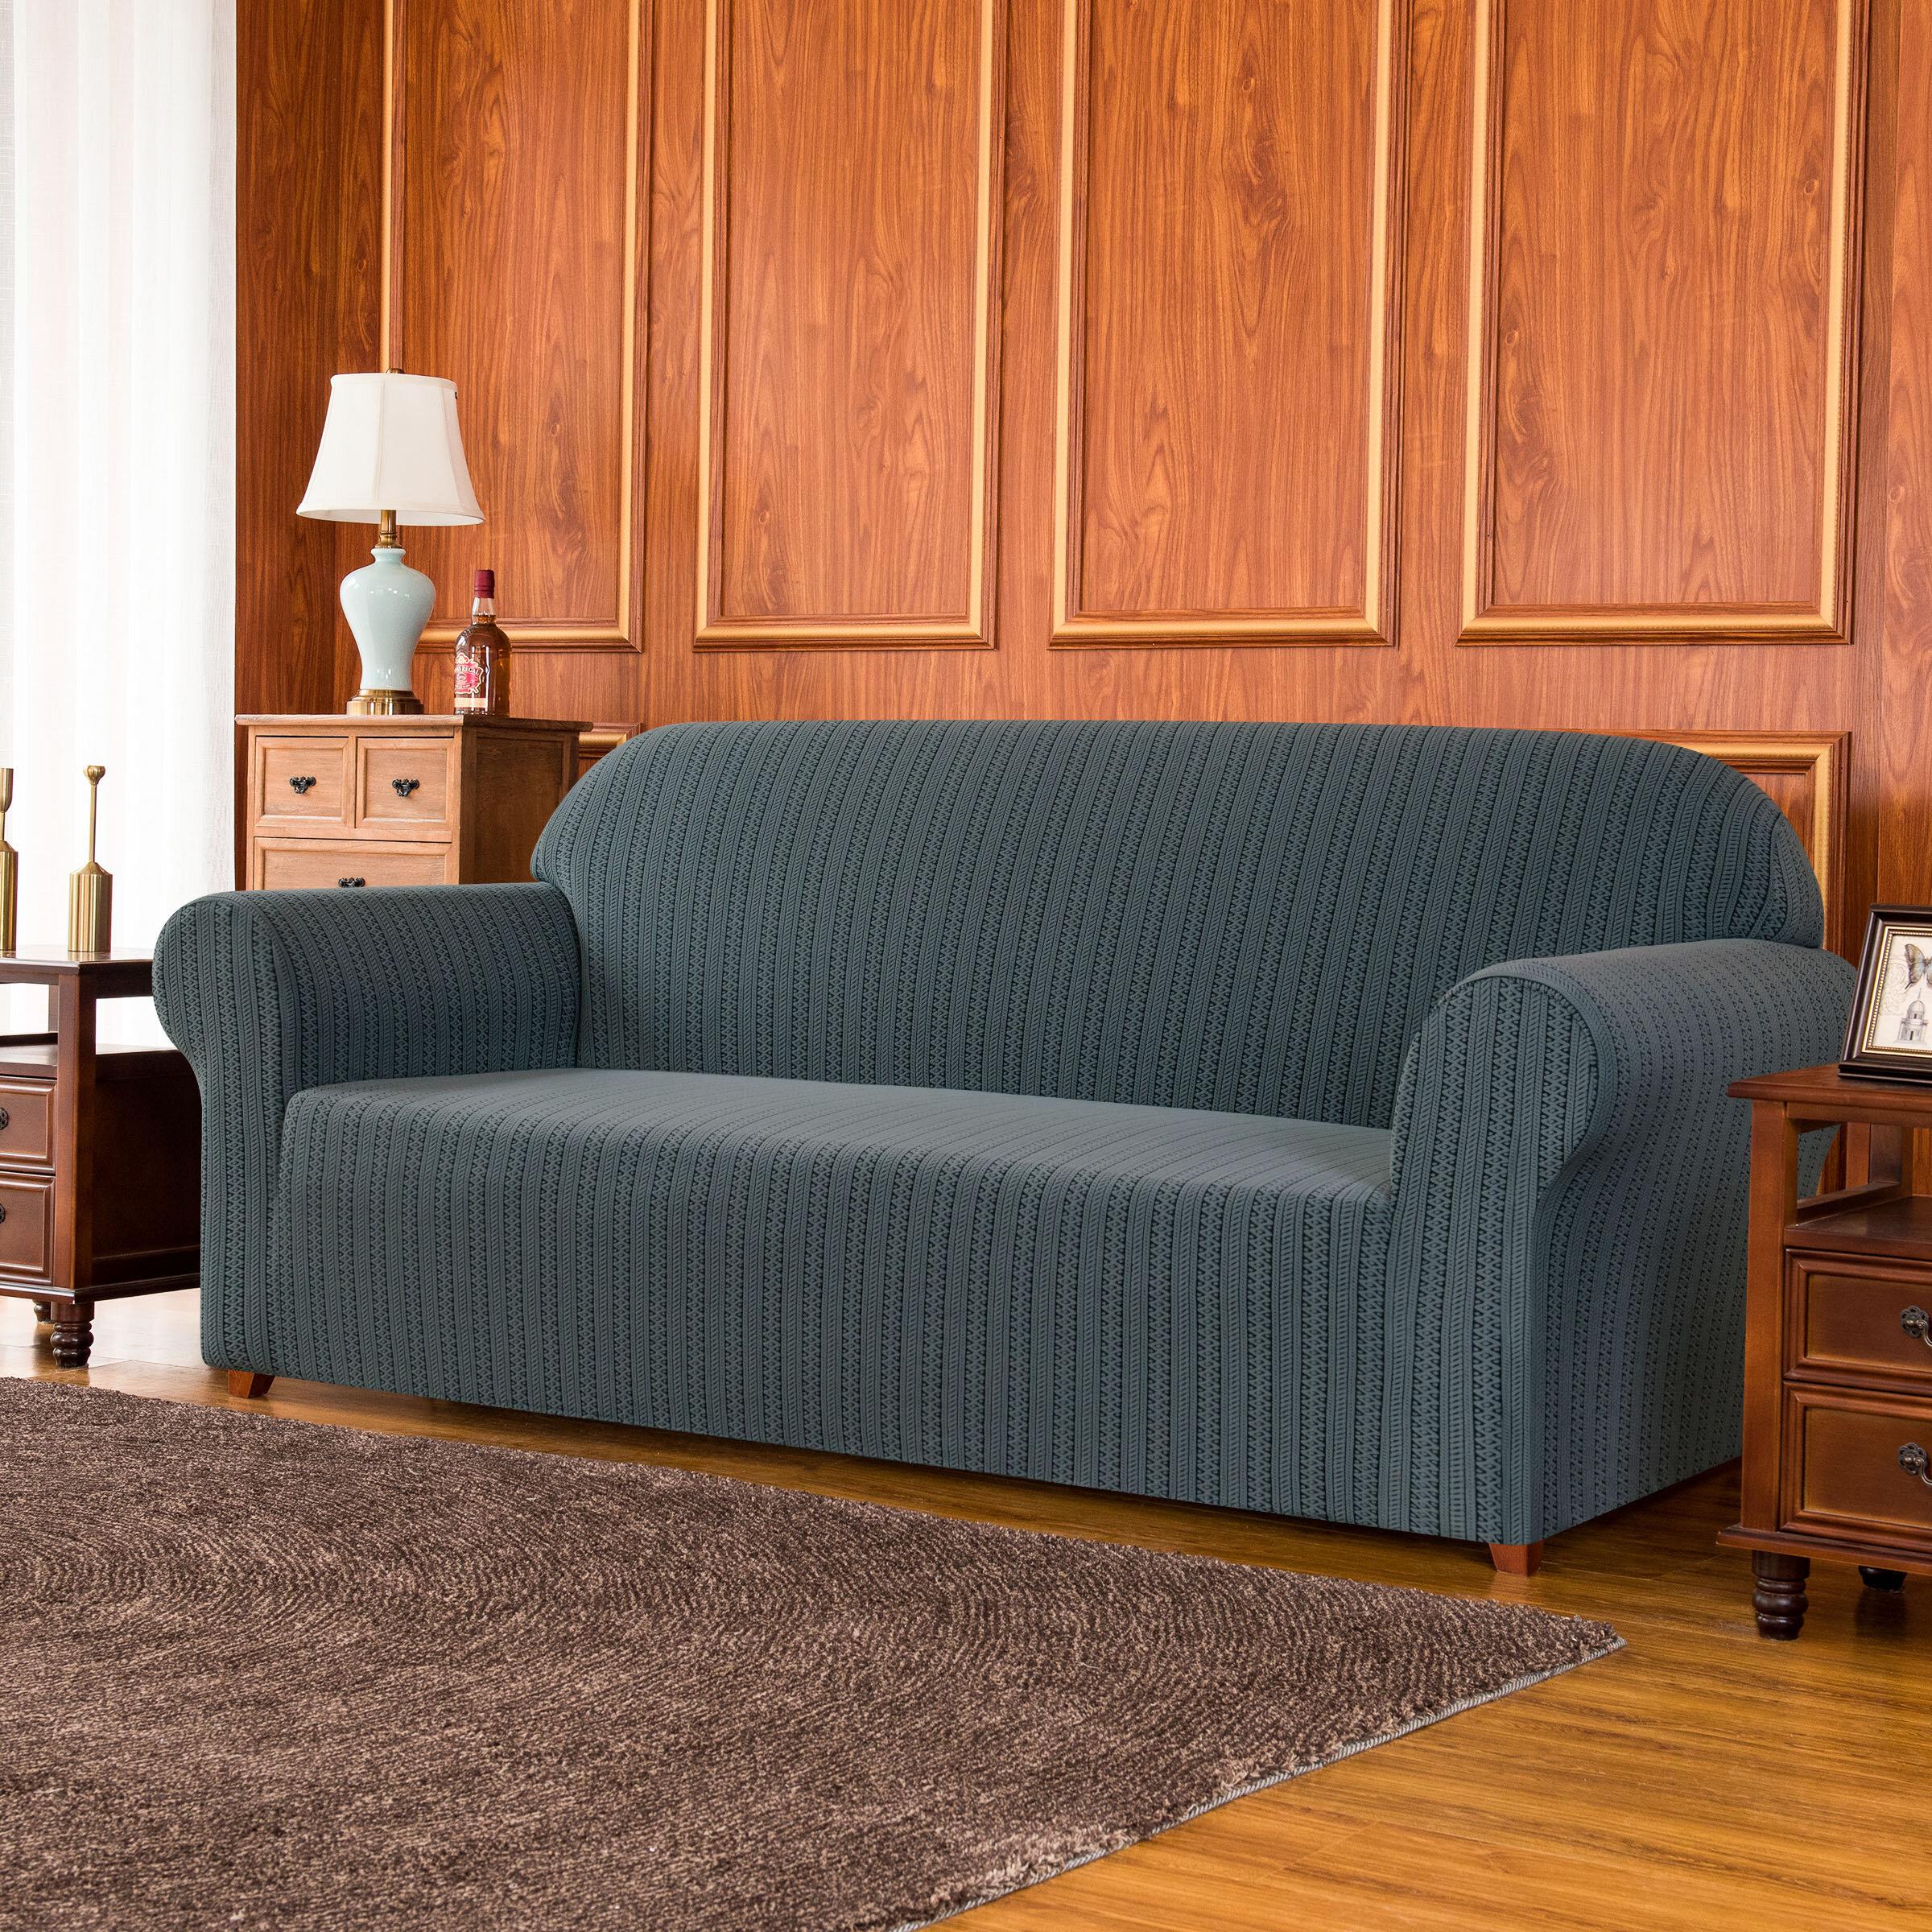 World Menagerie Striped Jacquard Box Cushion Loveseat Slipcover Wayfair Co Uk